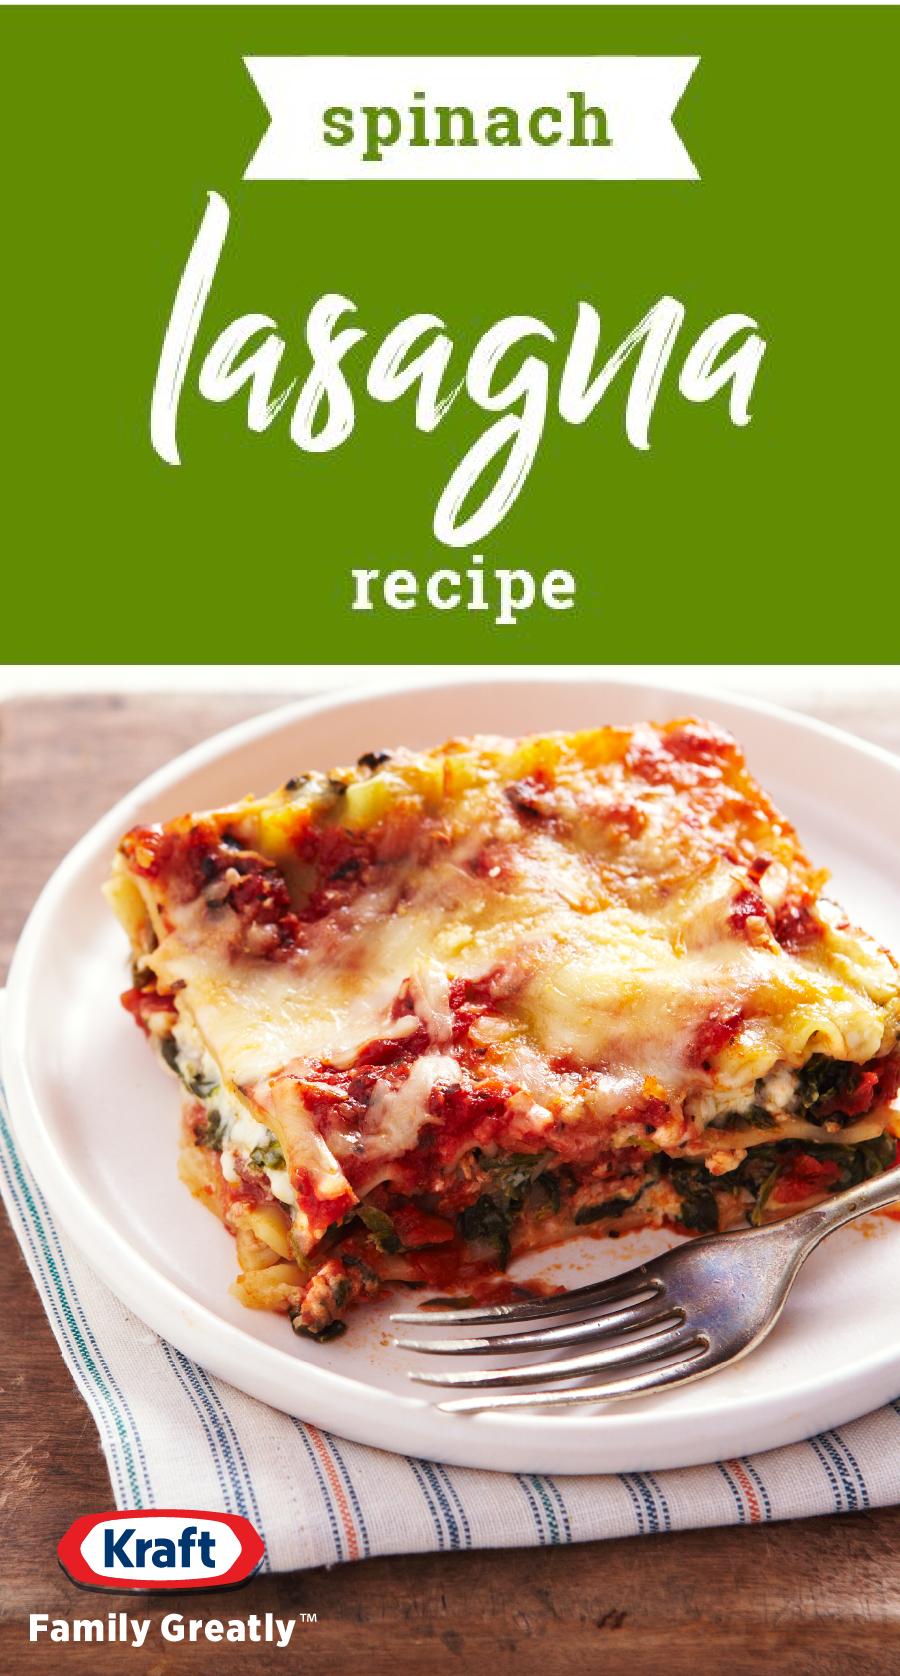 Spinach Lasagna Recipe Recipe Recipes Lasagna Recipe Spinach Lasagna